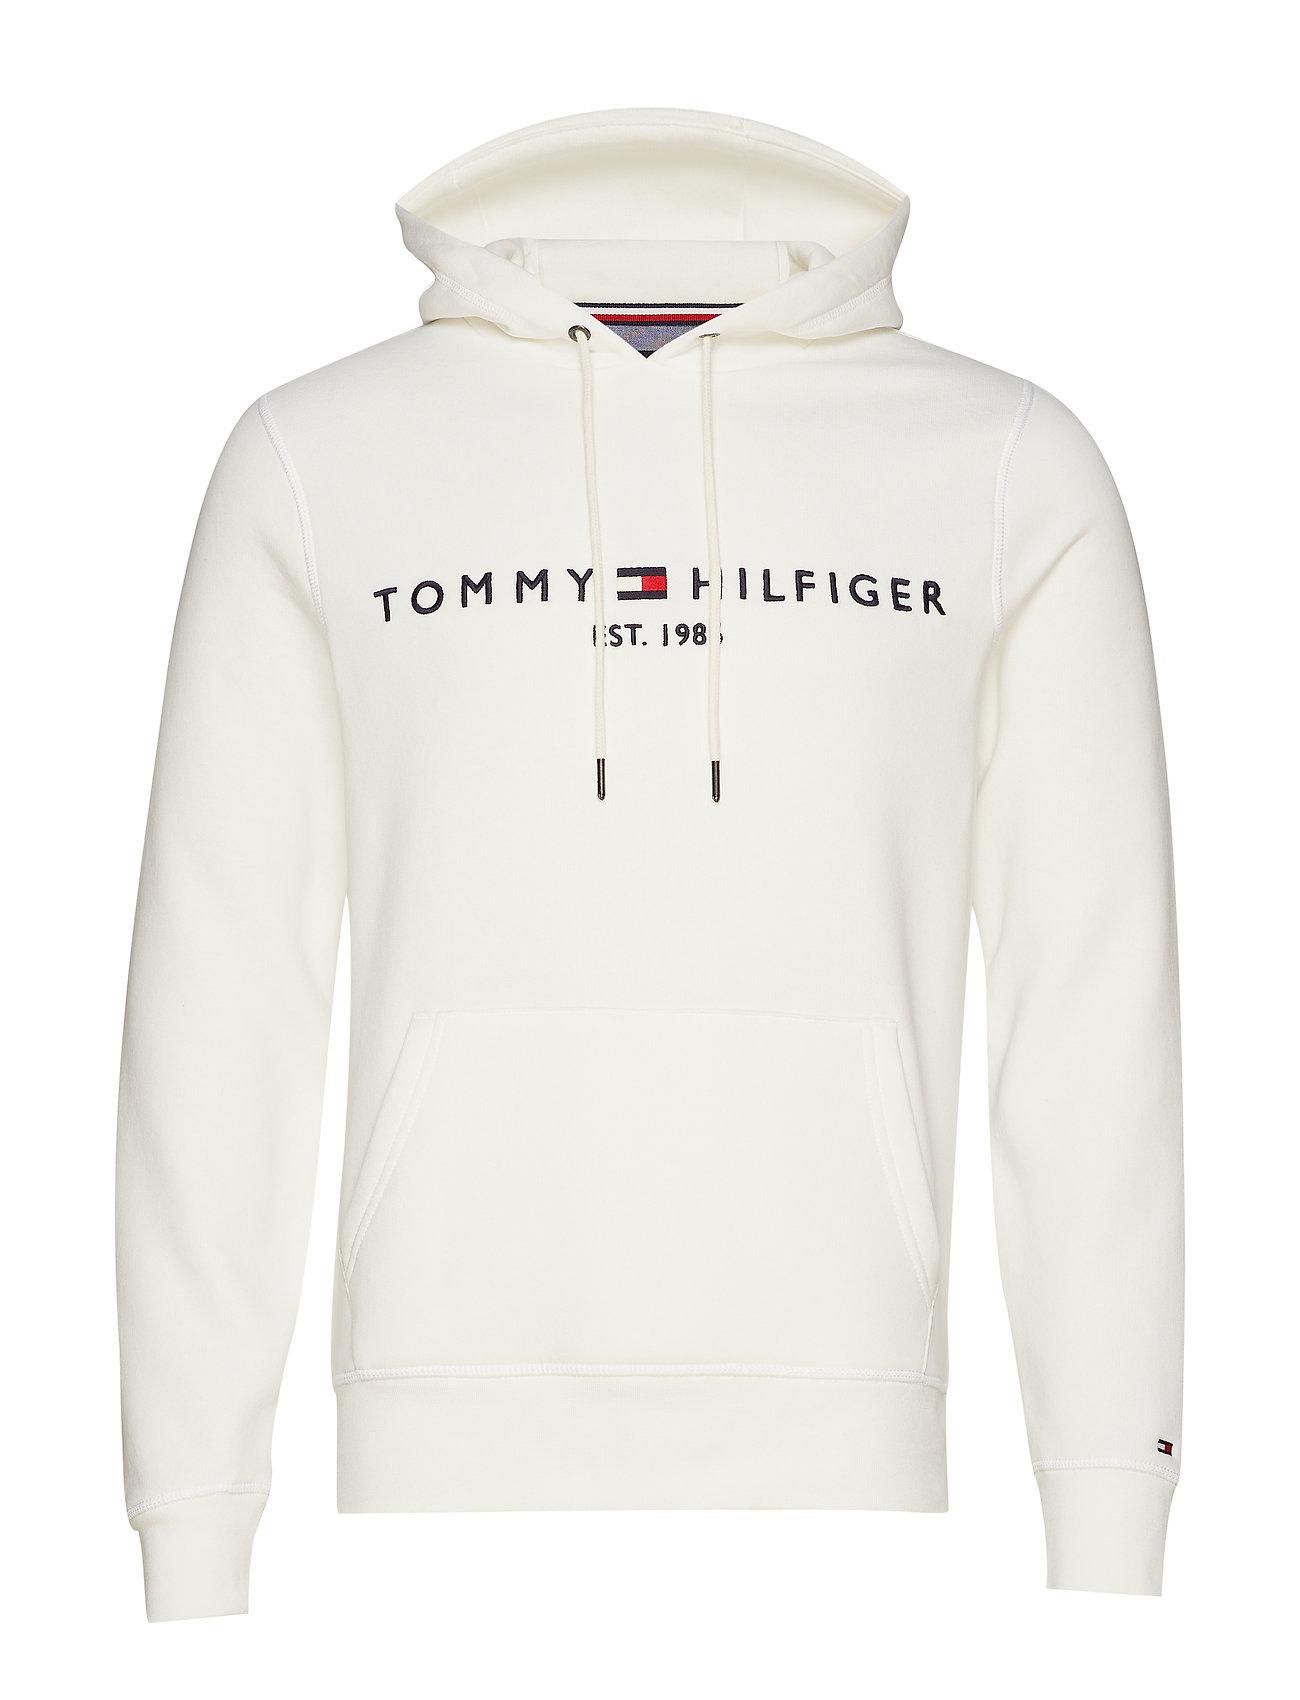 Image of Tommy Logo Hoody Hoodie Trøje Hvid Tommy Hilfiger (3452146893)